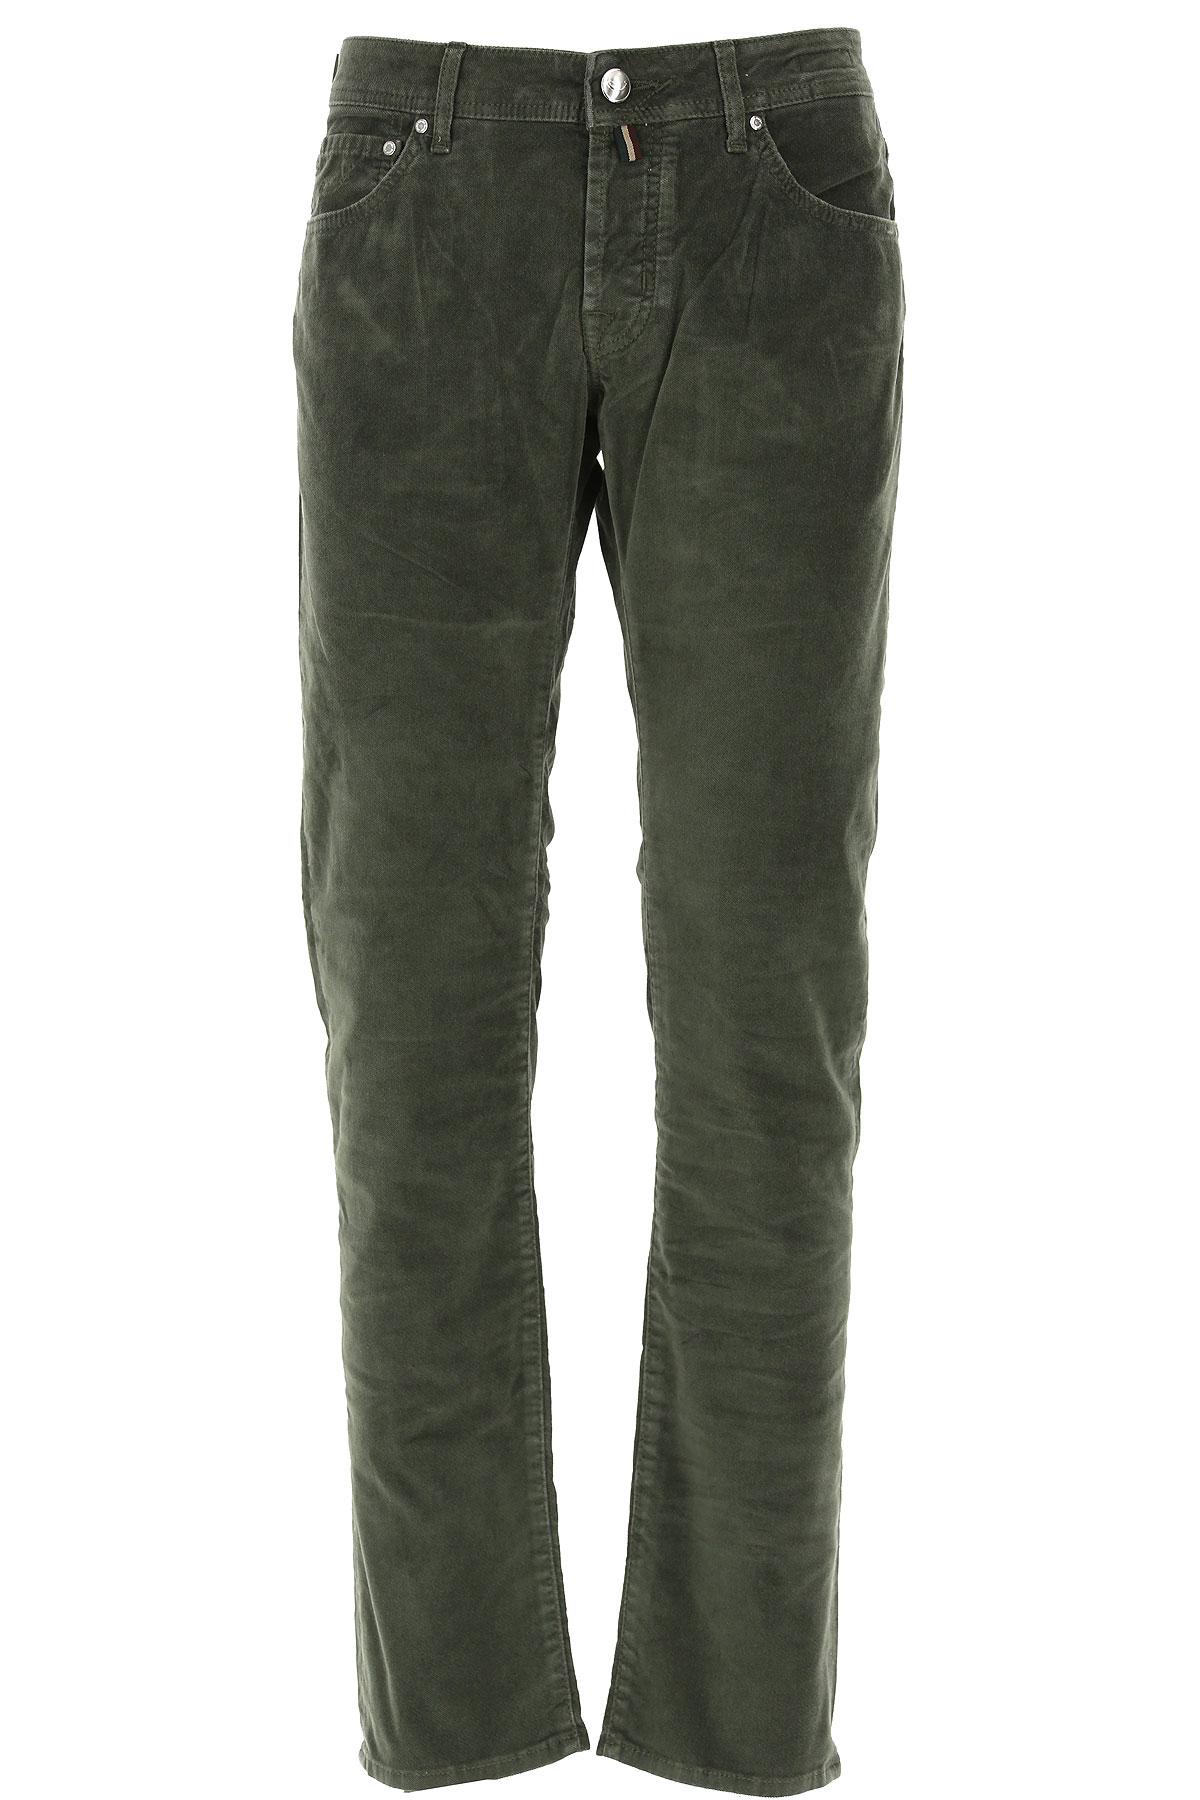 Jacob Cohen Jeans On Sale, Dark Green, Cotton, 2019, 31 33 34 36